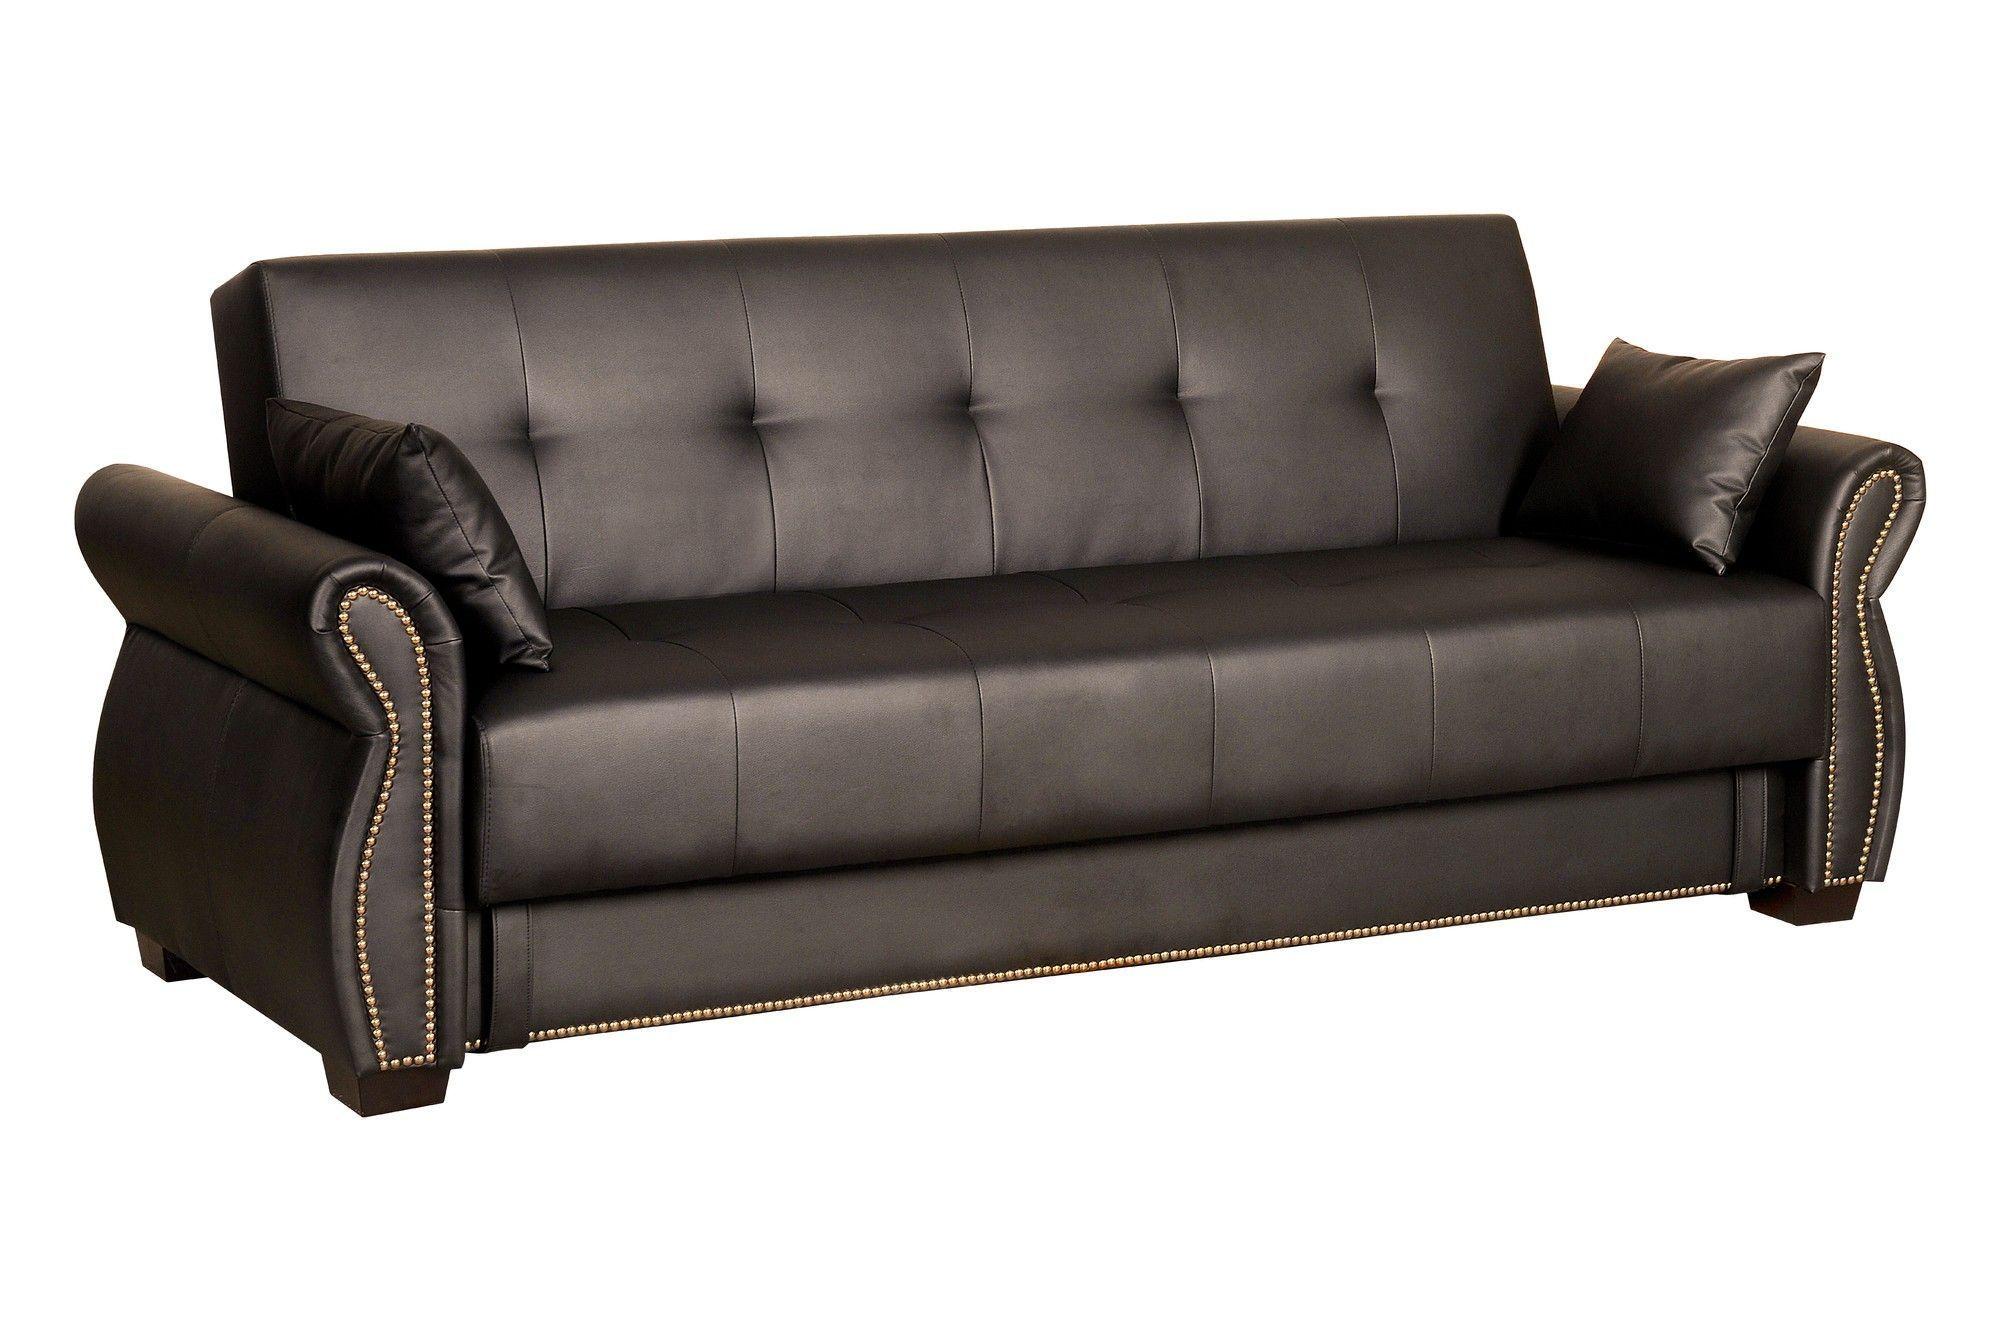 Serta Dream Avanzo Convertible Sofa CheapMemoryFoam Cheap Memory